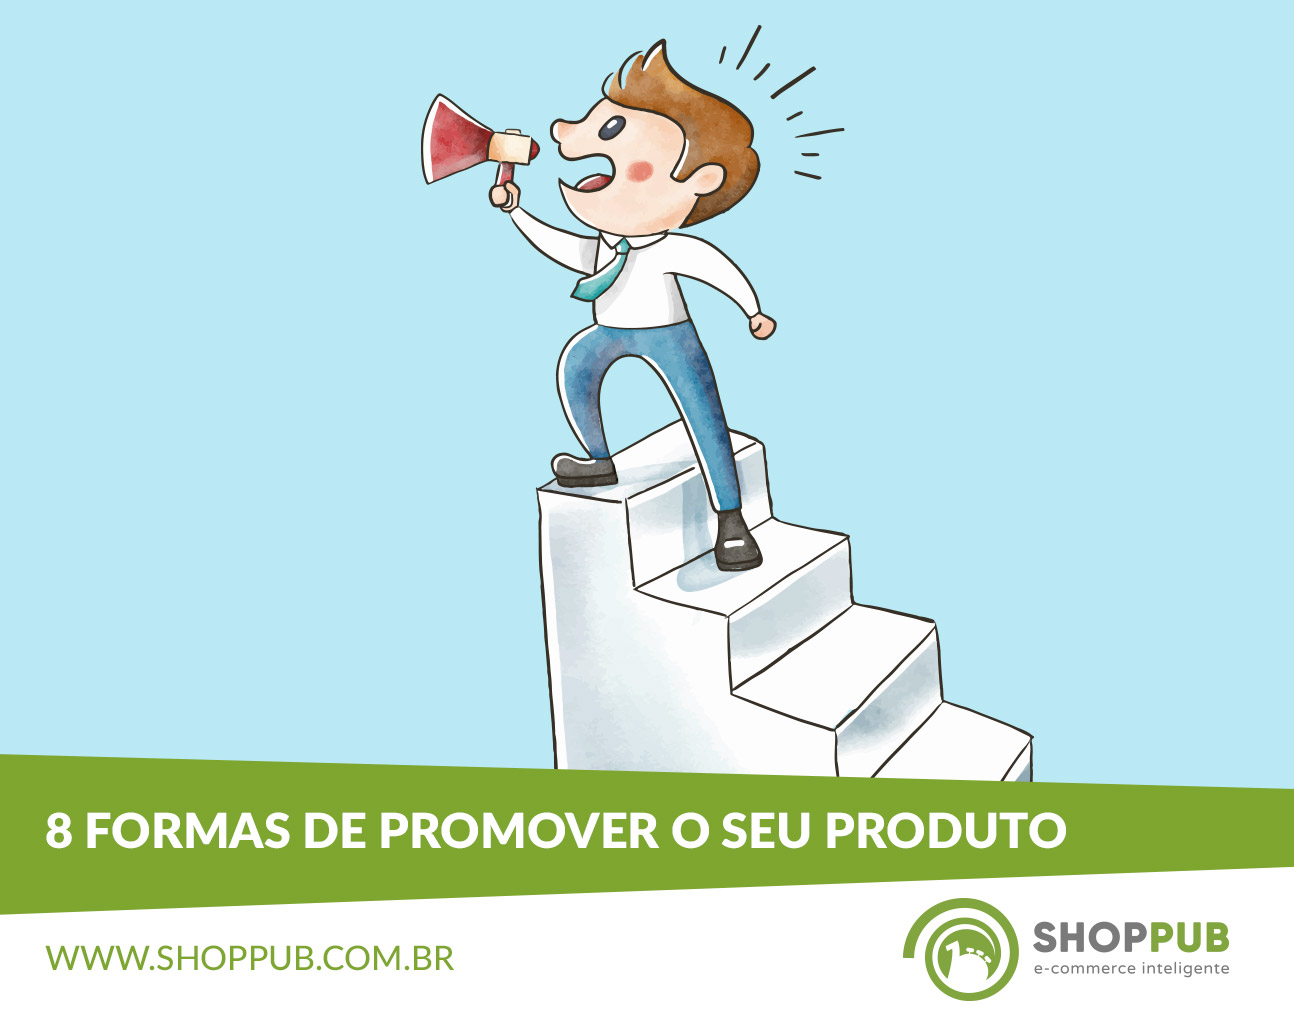 8 formas de promover o seu produto